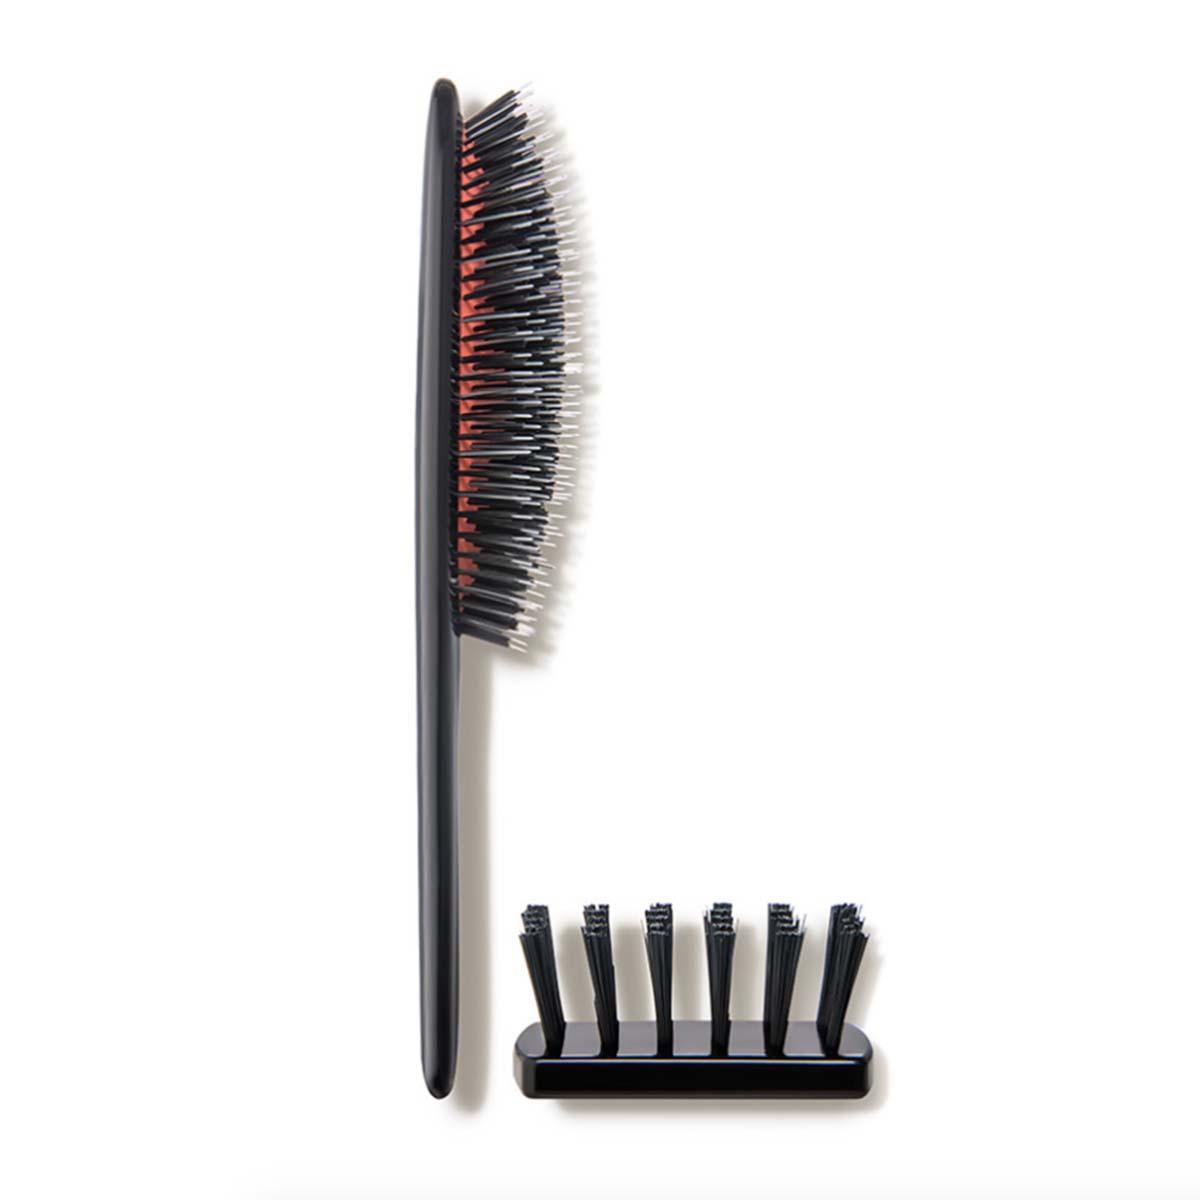 Brush and Cleaning Brush